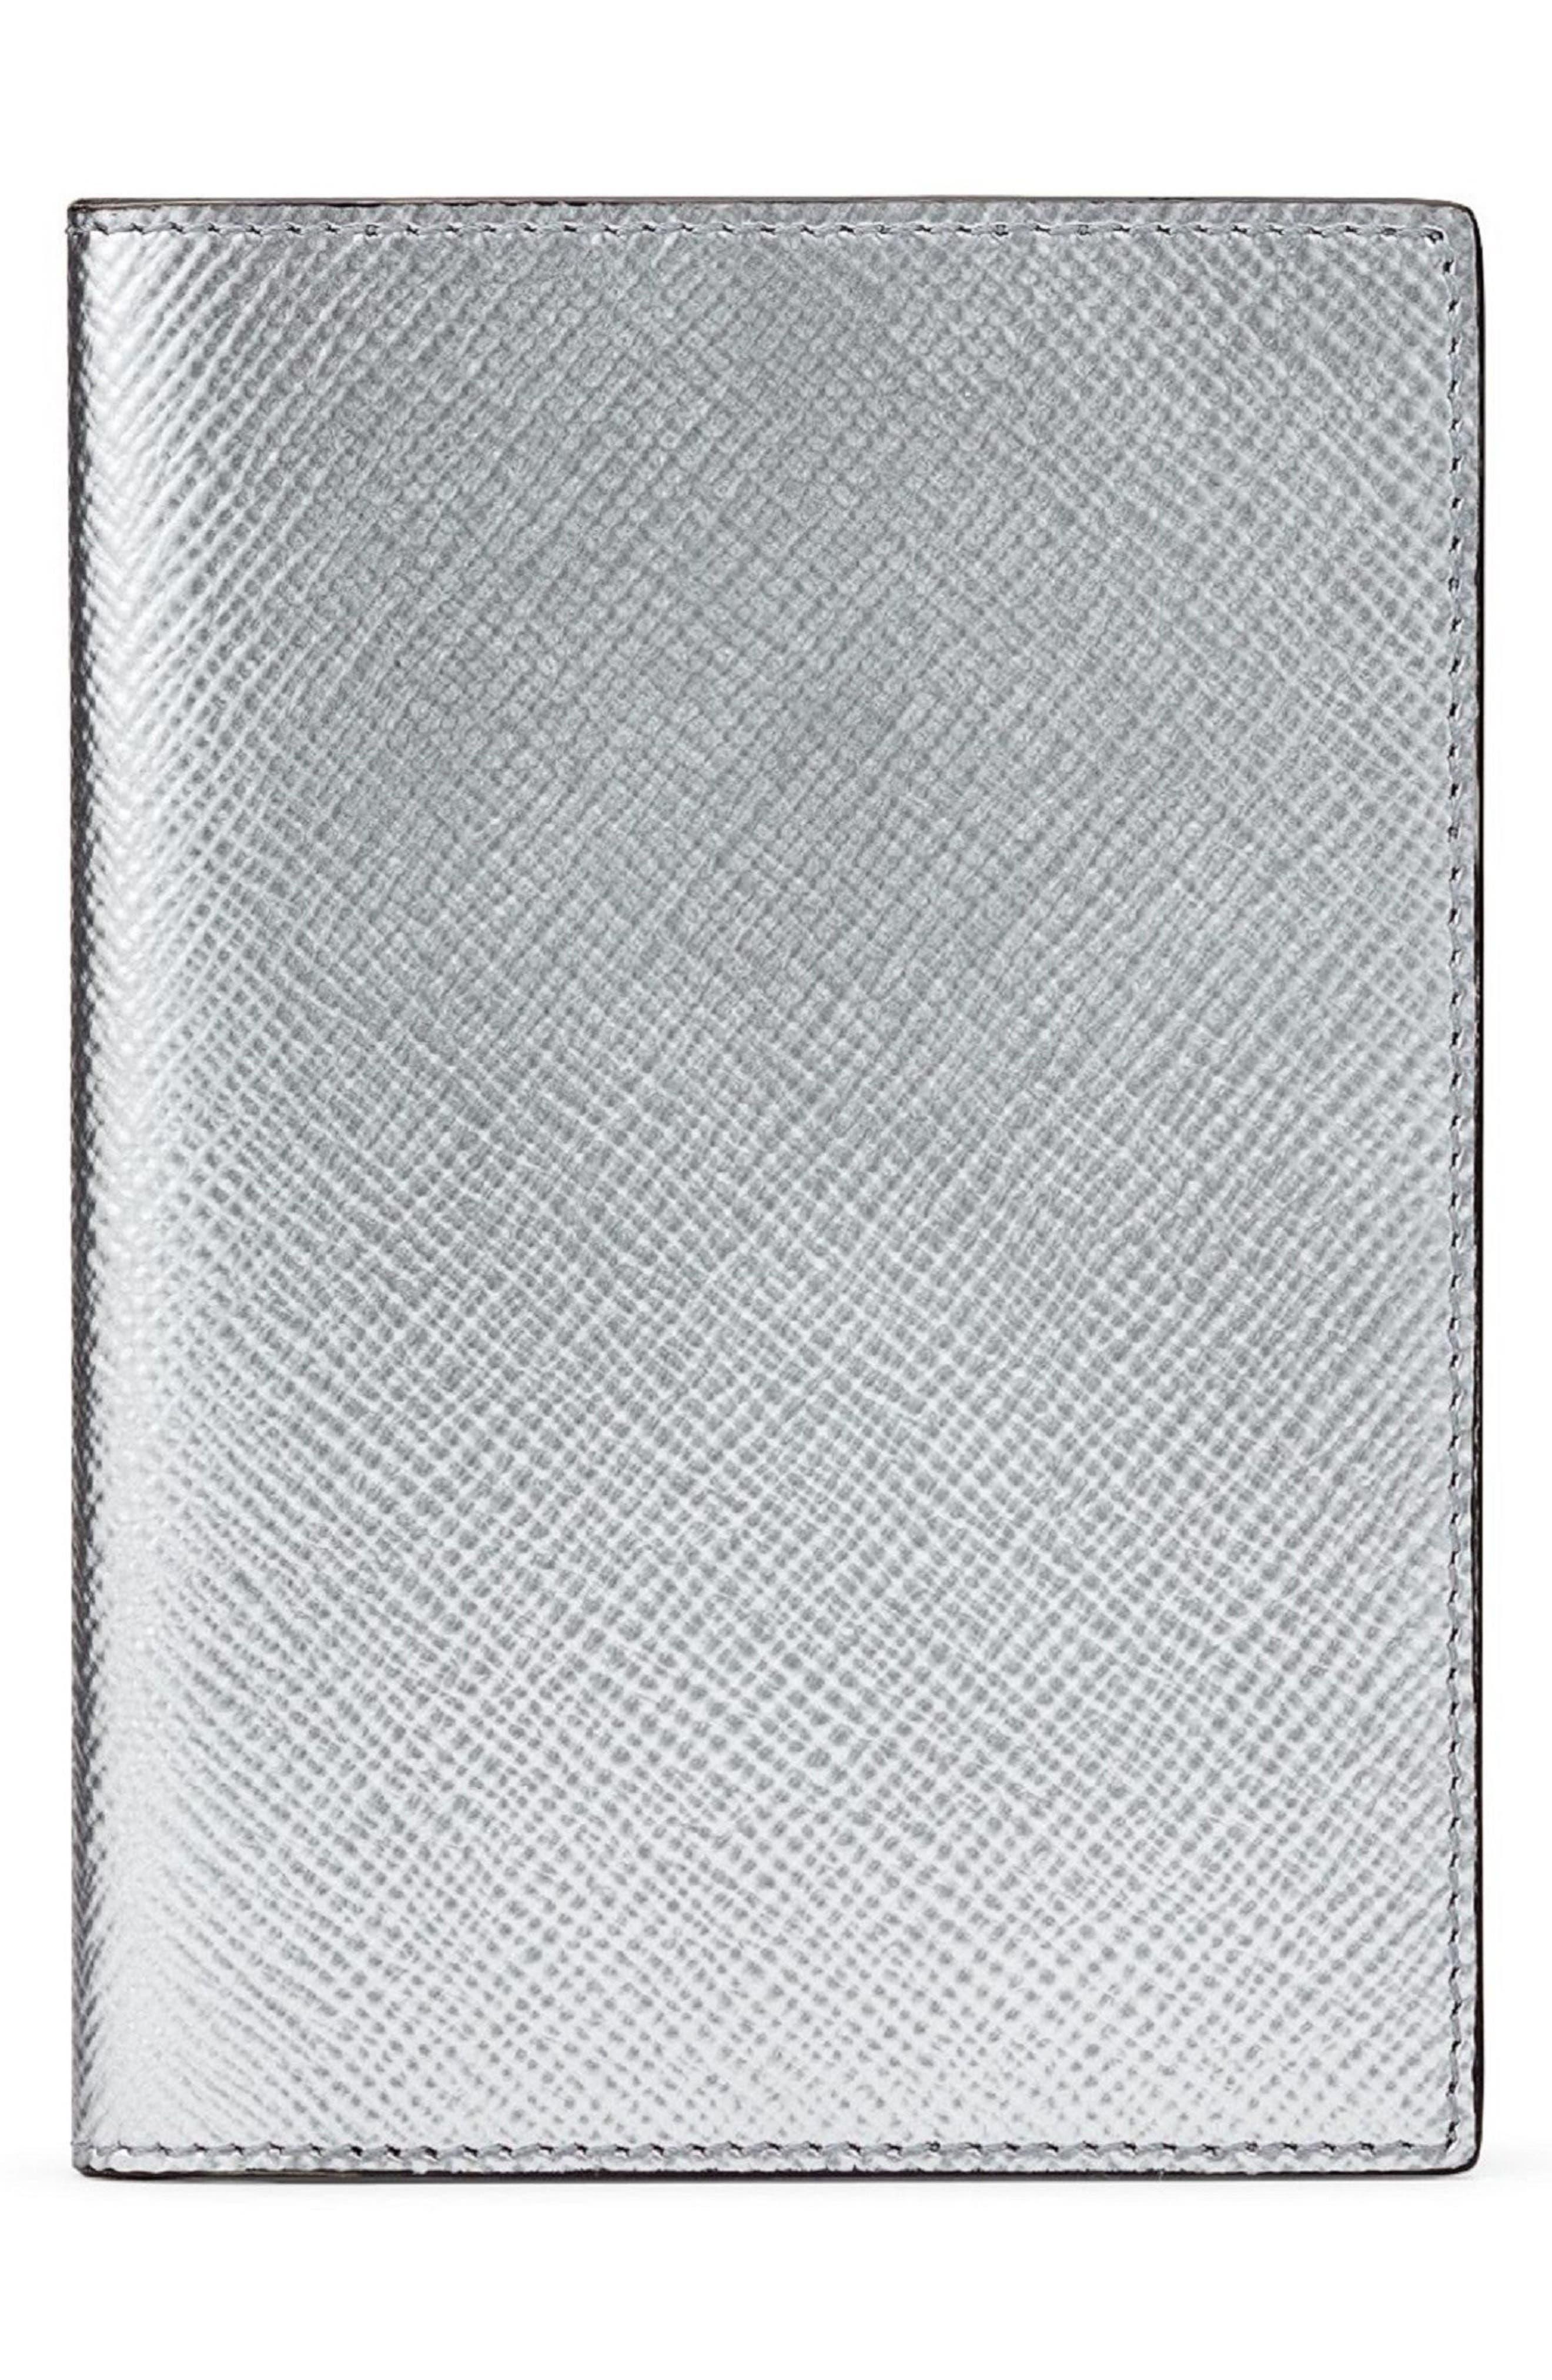 Panama Calfskin Leather Passport Case,                         Main,                         color, Silver